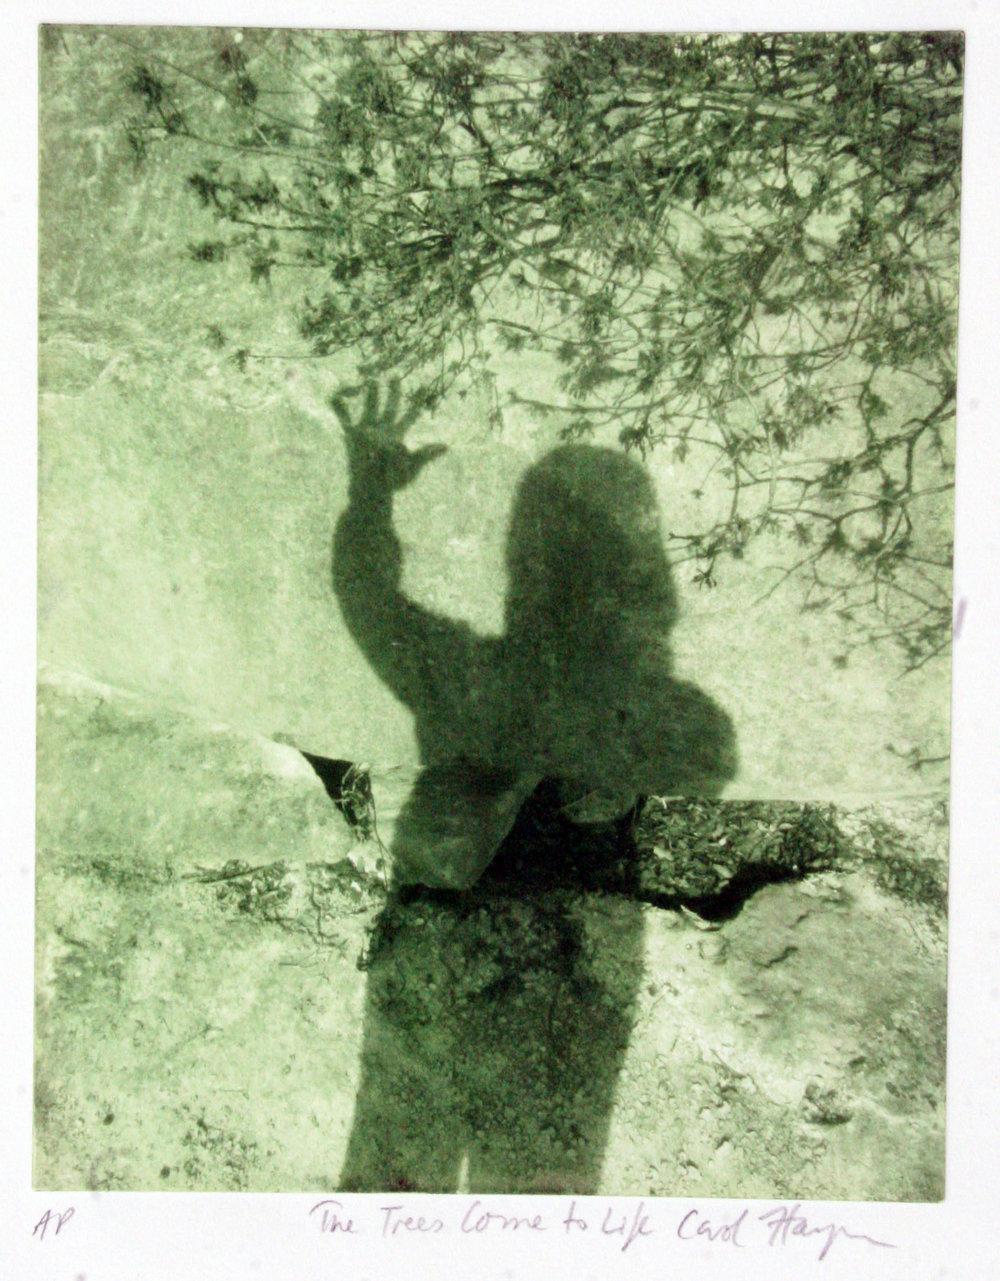 Carol Hayman: Trees Come to Life